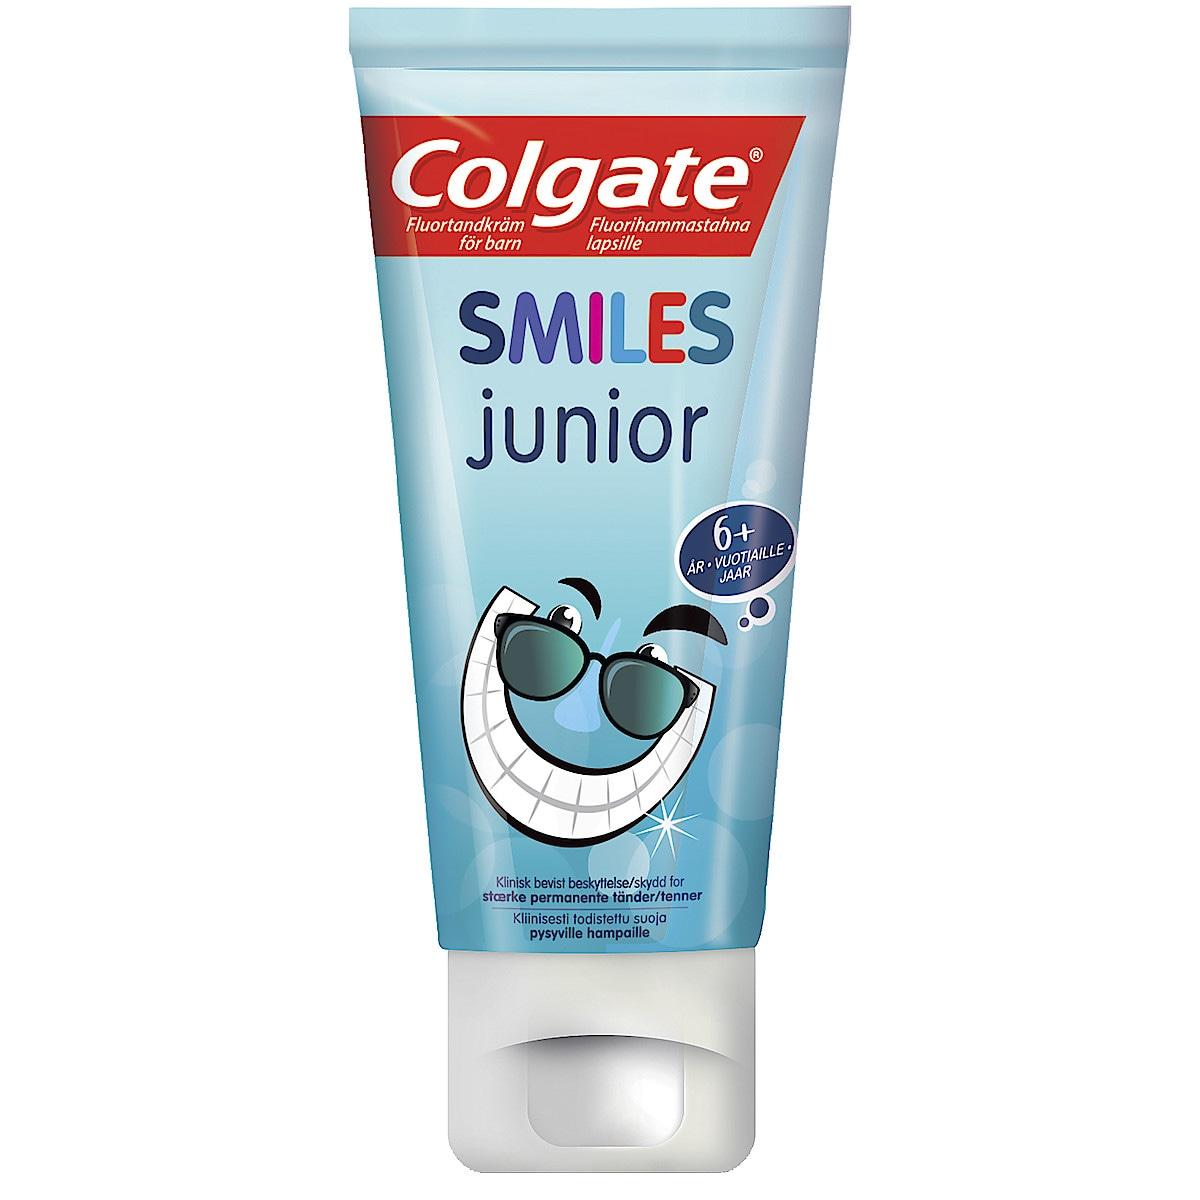 Tandkräm Colgate Smiles Junior 6+ år 50 ml